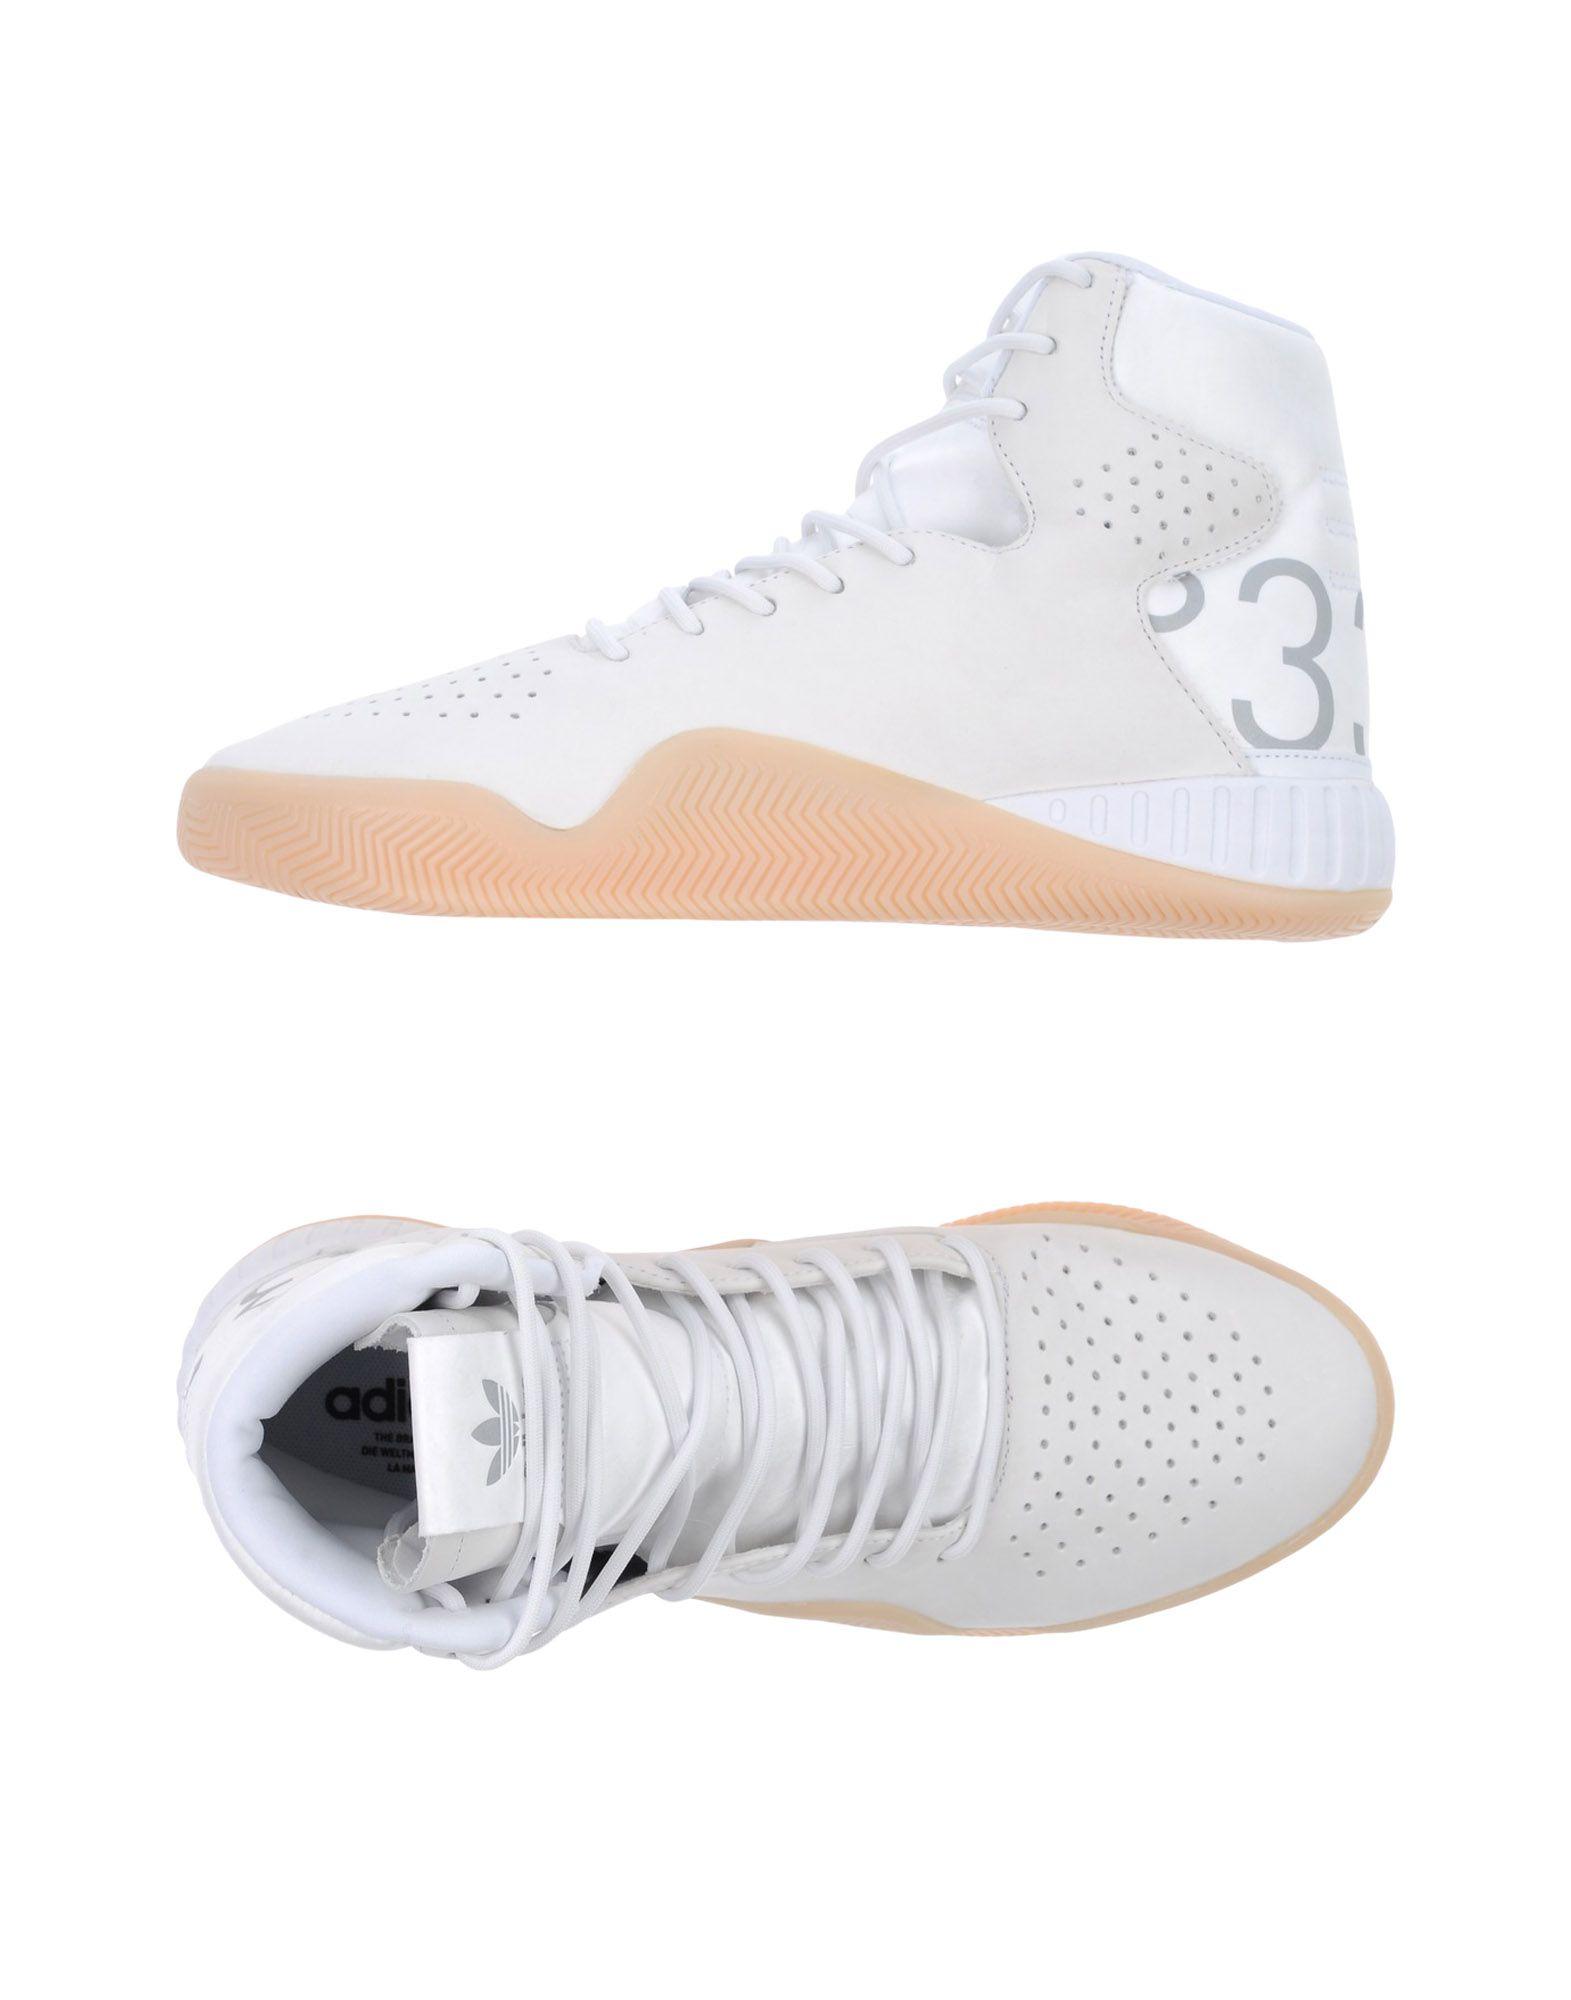 Adidas Originals Sneakers - Men Adidas Originals Sneakers Sneakers Sneakers online on  Australia - 11335383OS e12ccc